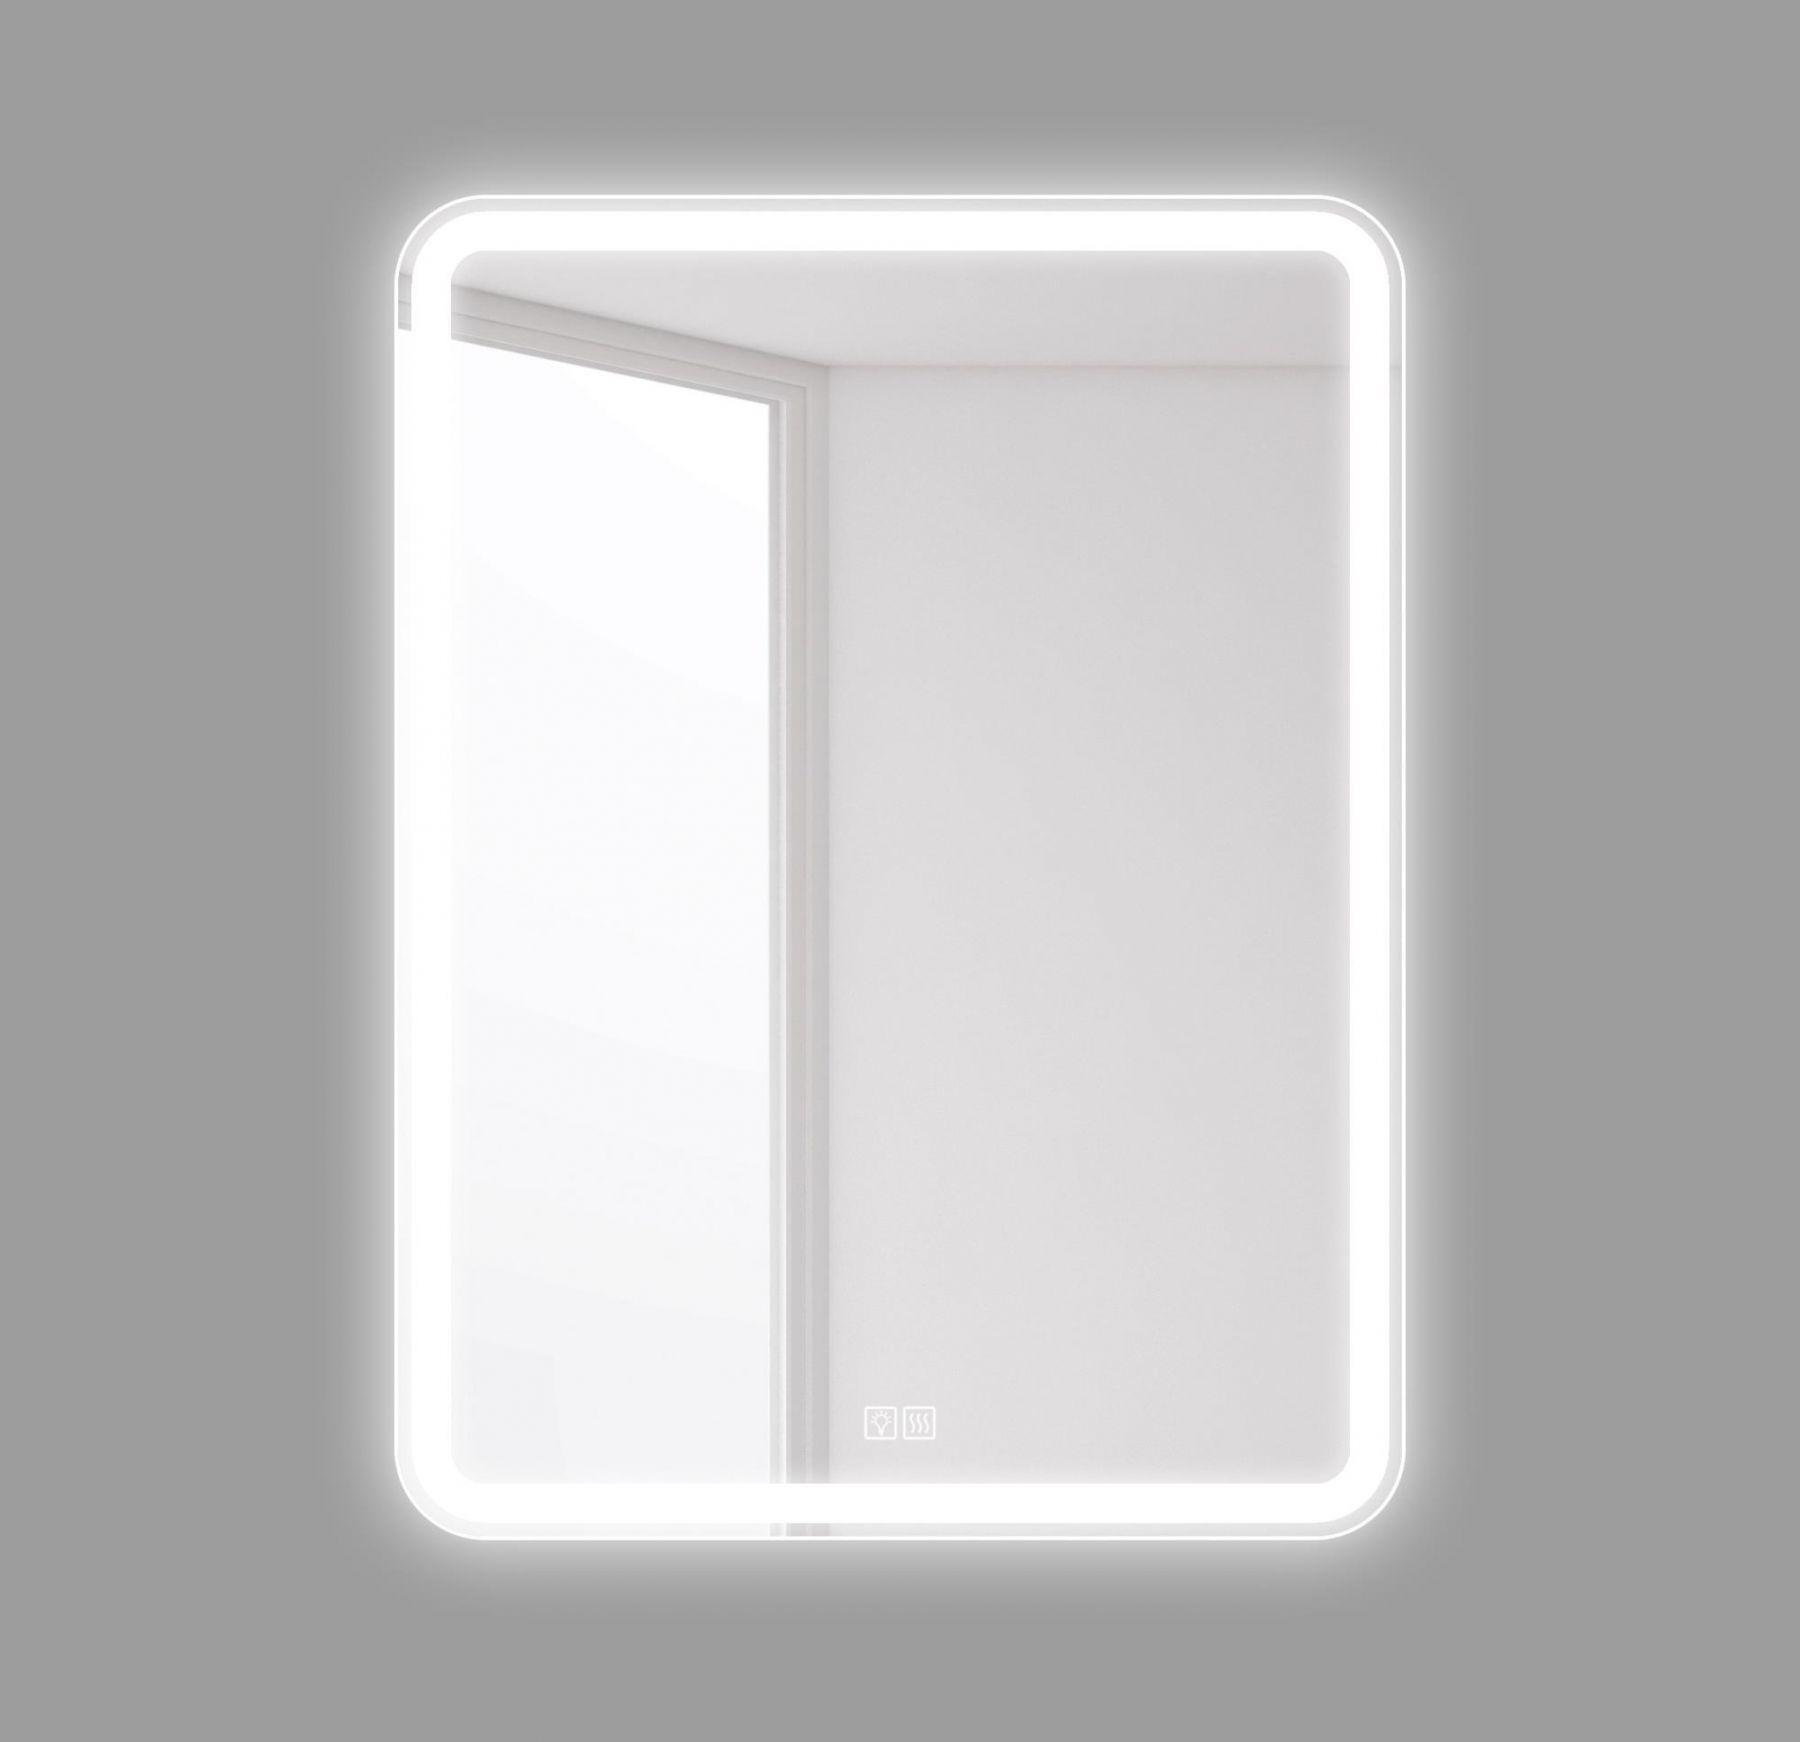 Зеркало для ванной комнаты BelBagno SPC-MAR-600-800-LED-TCH-WARM ФОТО